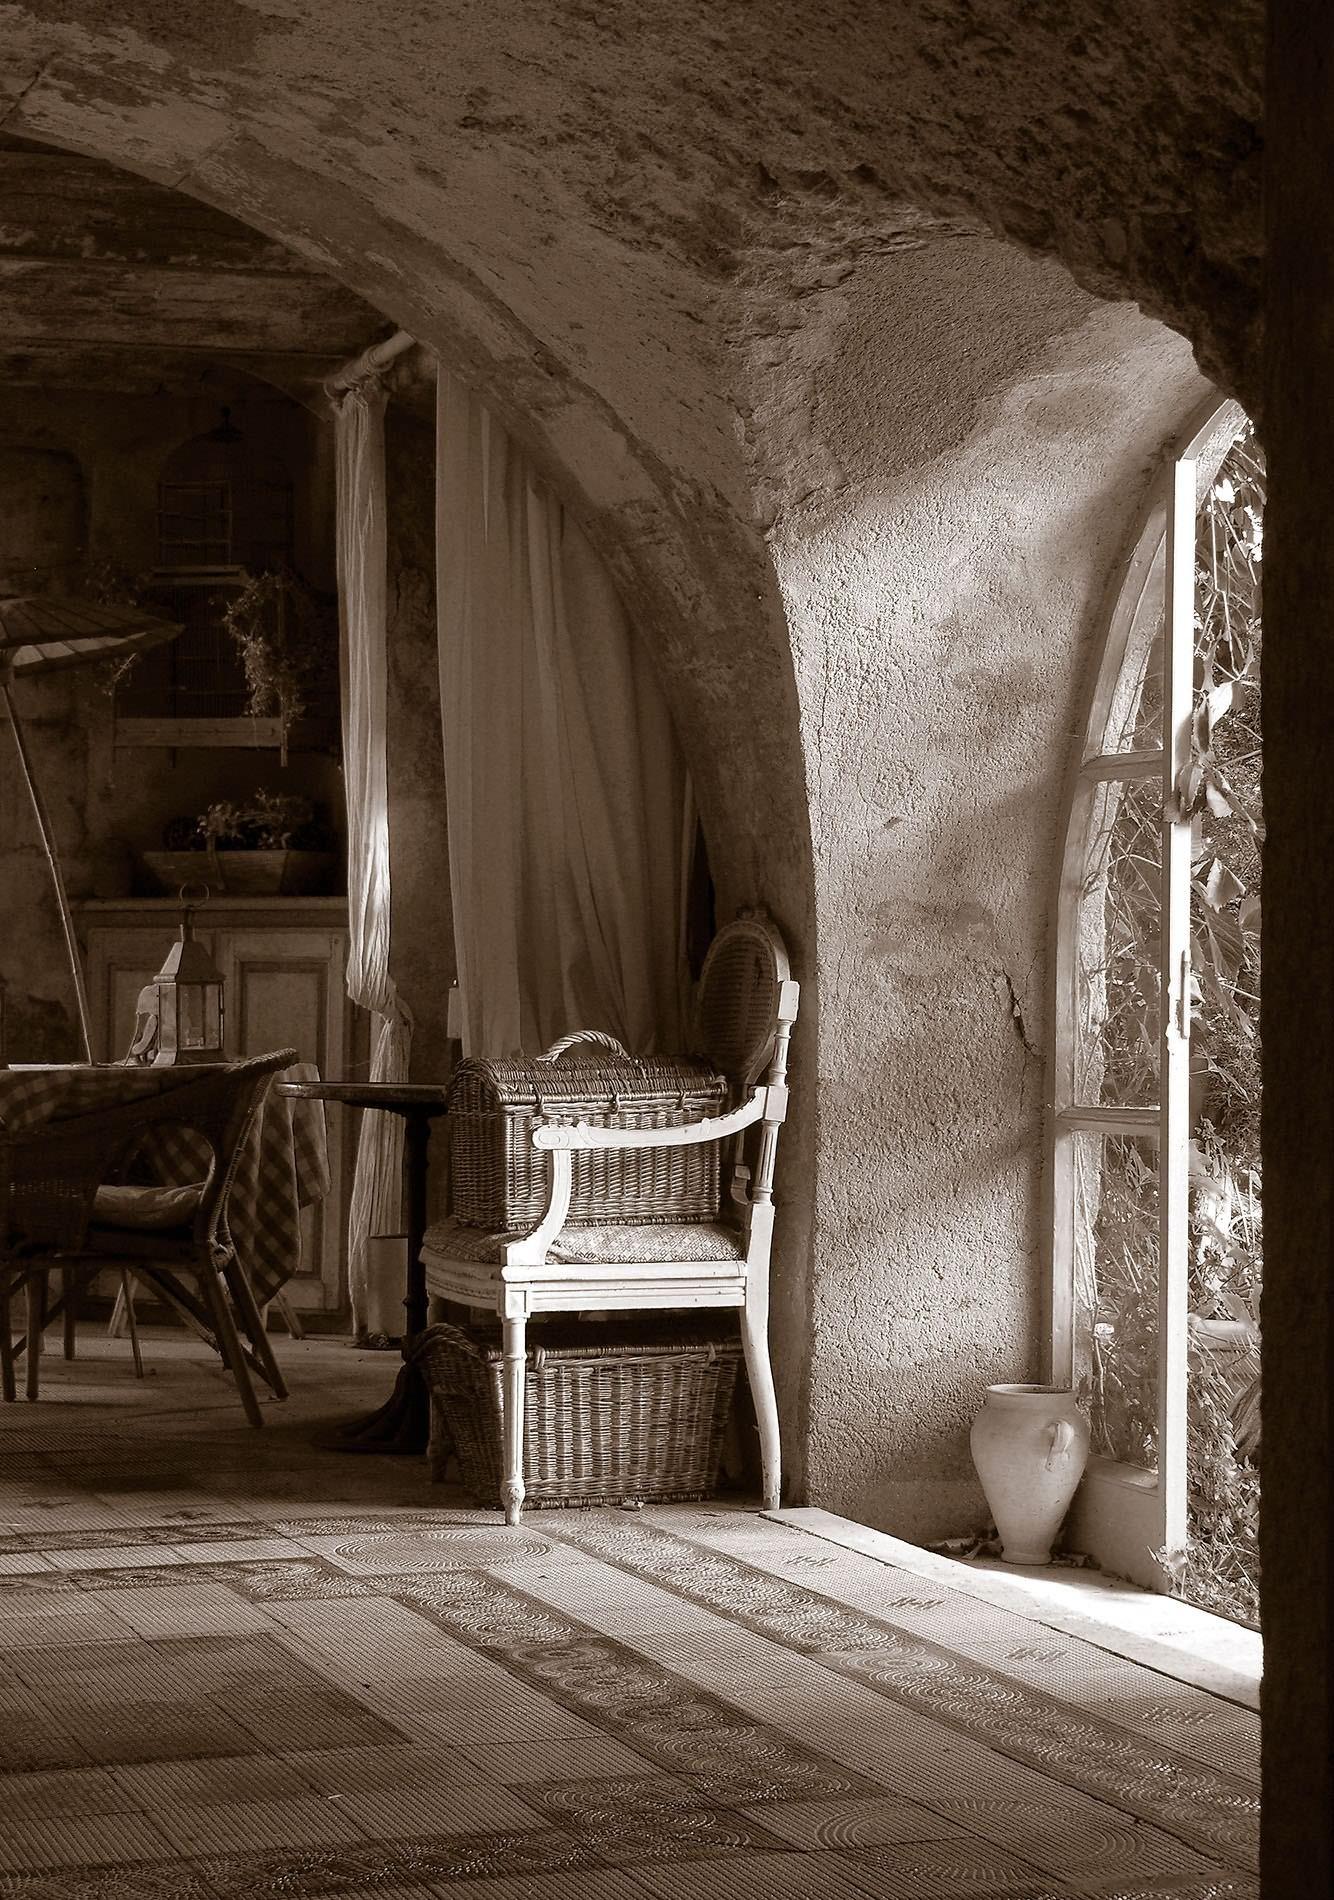 Gambar Cahaya Hitam Dan Putih Kayu Bangunan Dinding